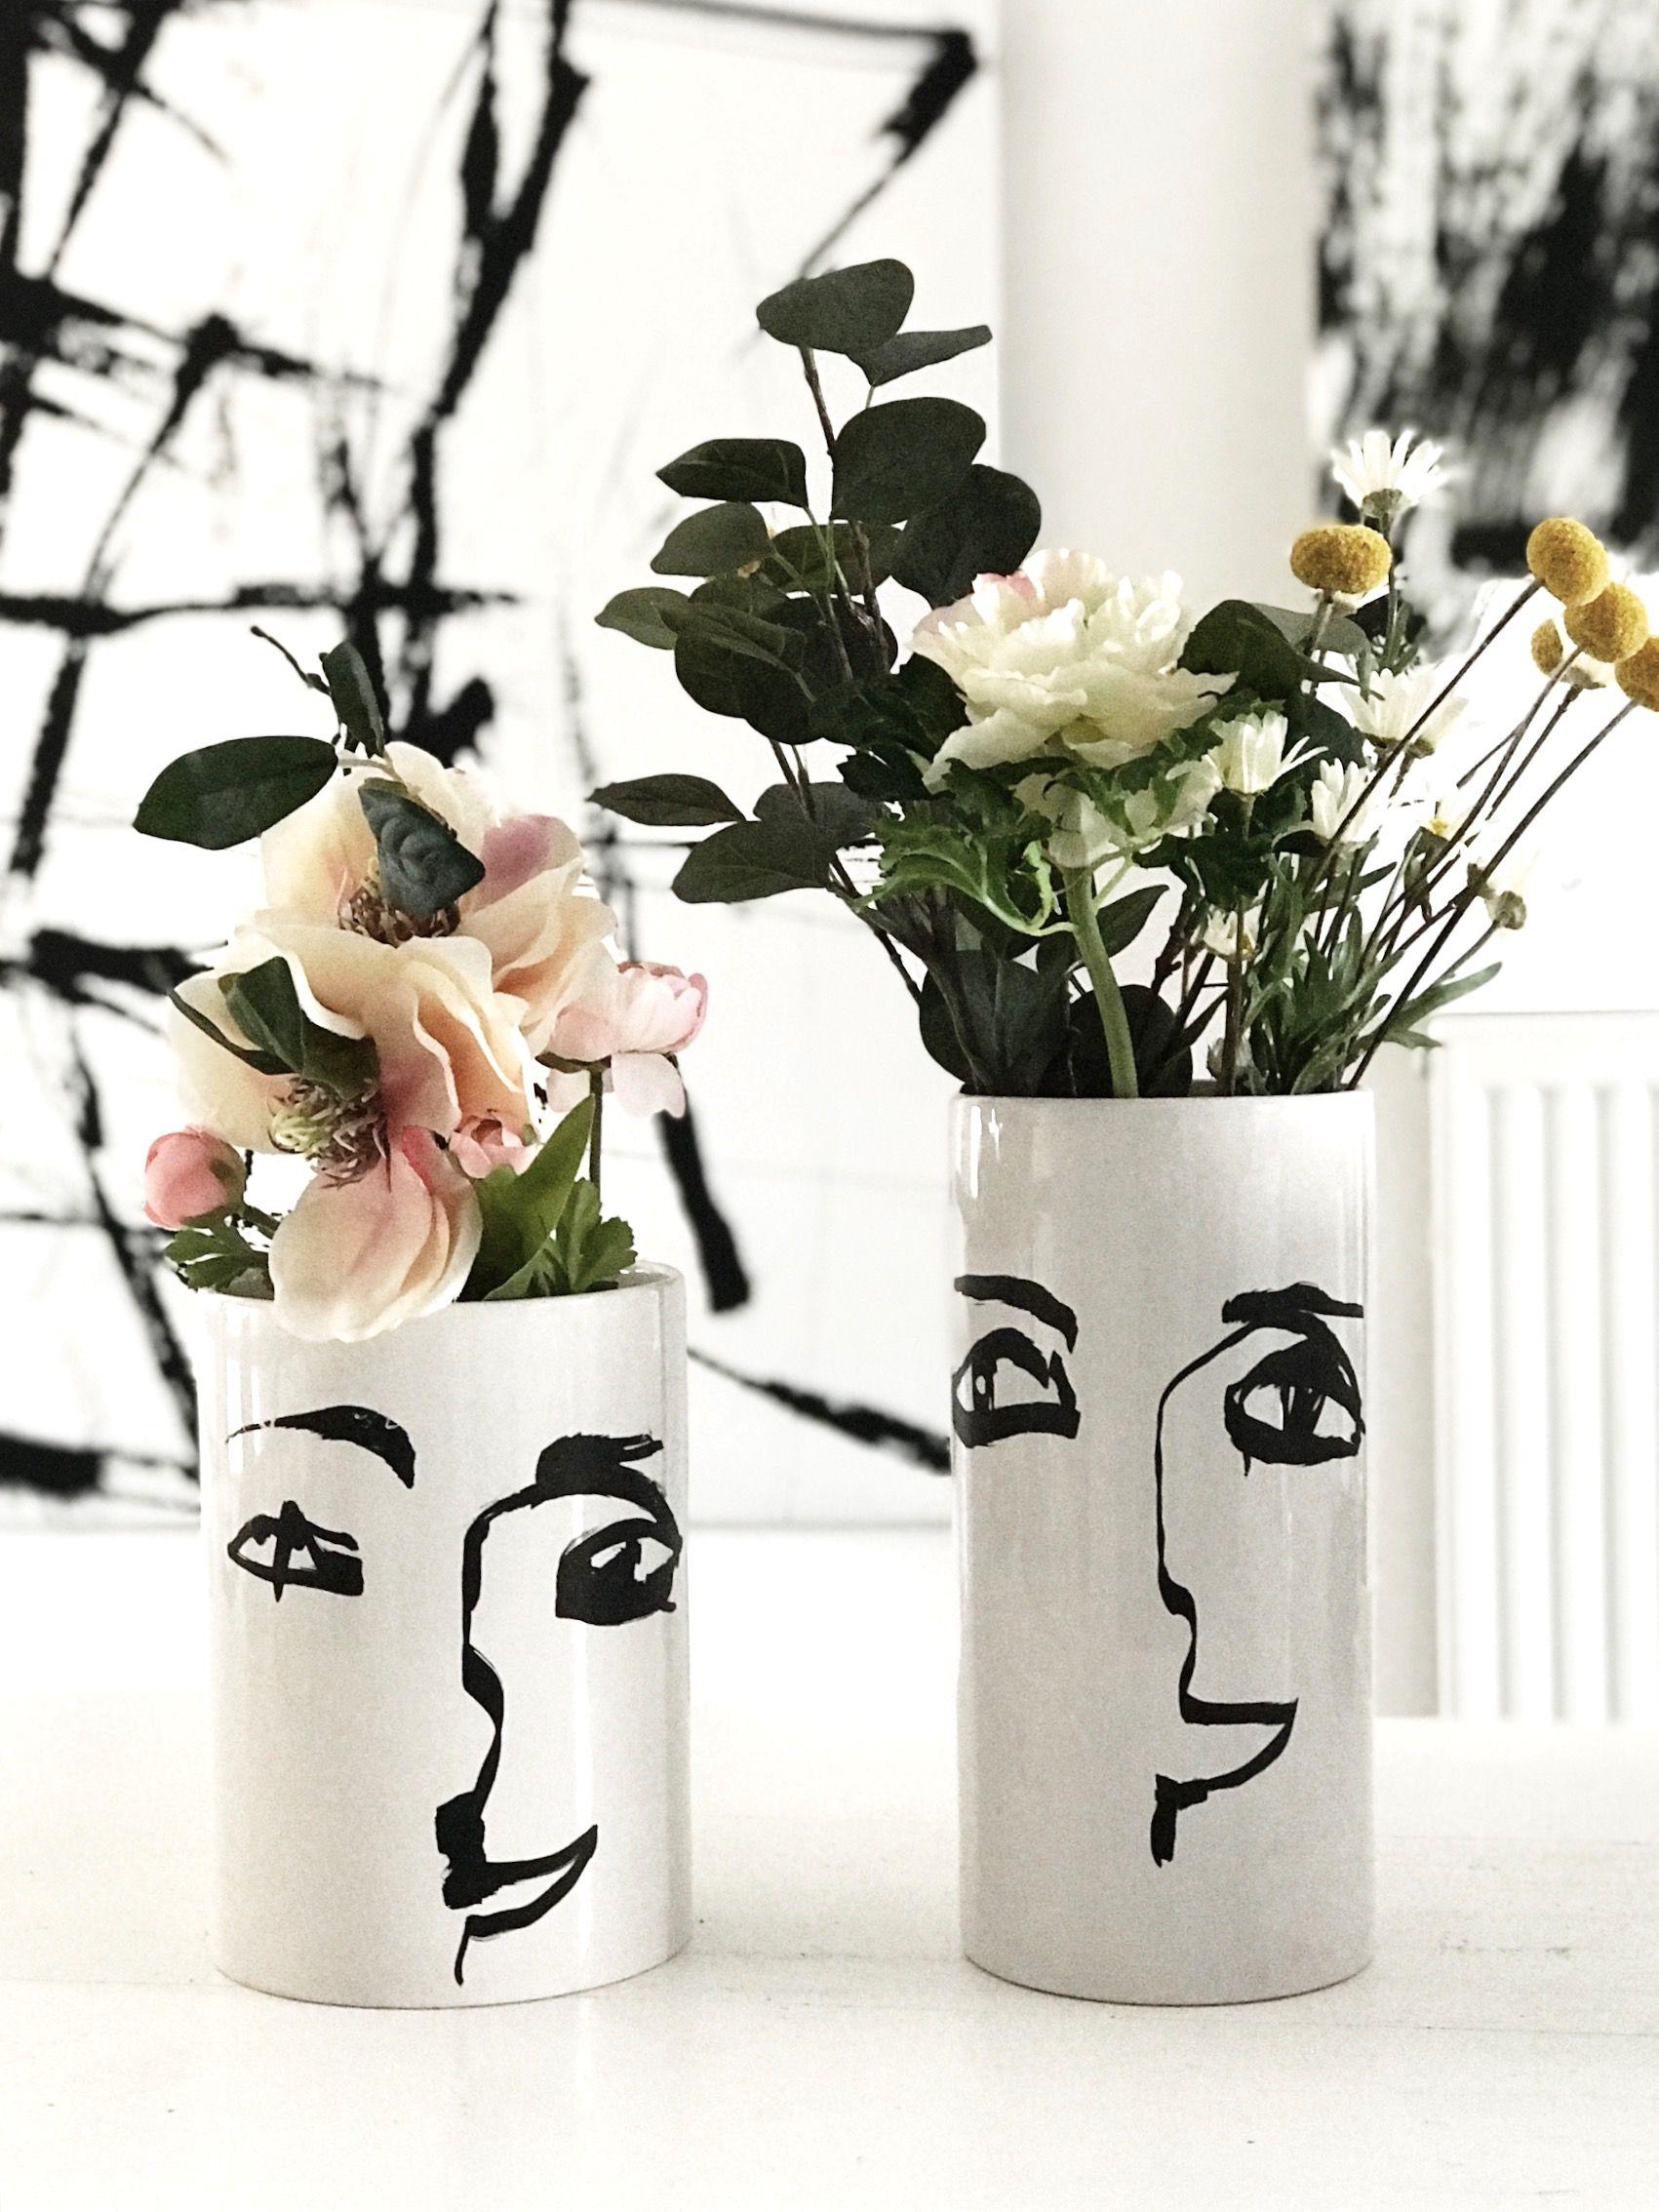 5 minuten diy  vase mit gesicht  sophiagaleria  diy